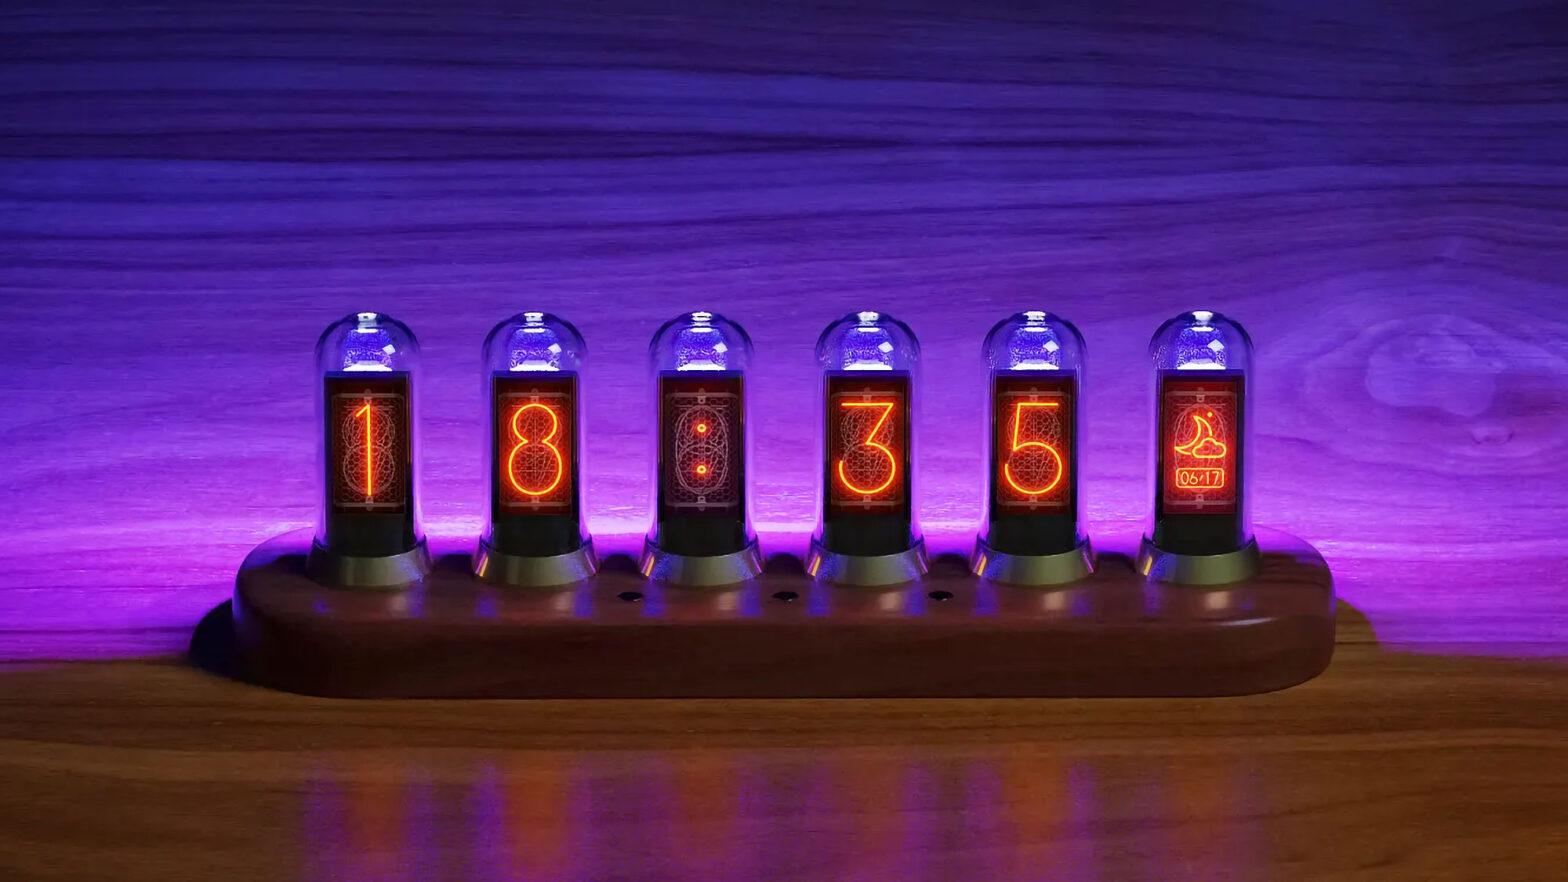 Nextube Retro Nixie Clock-inspired Display